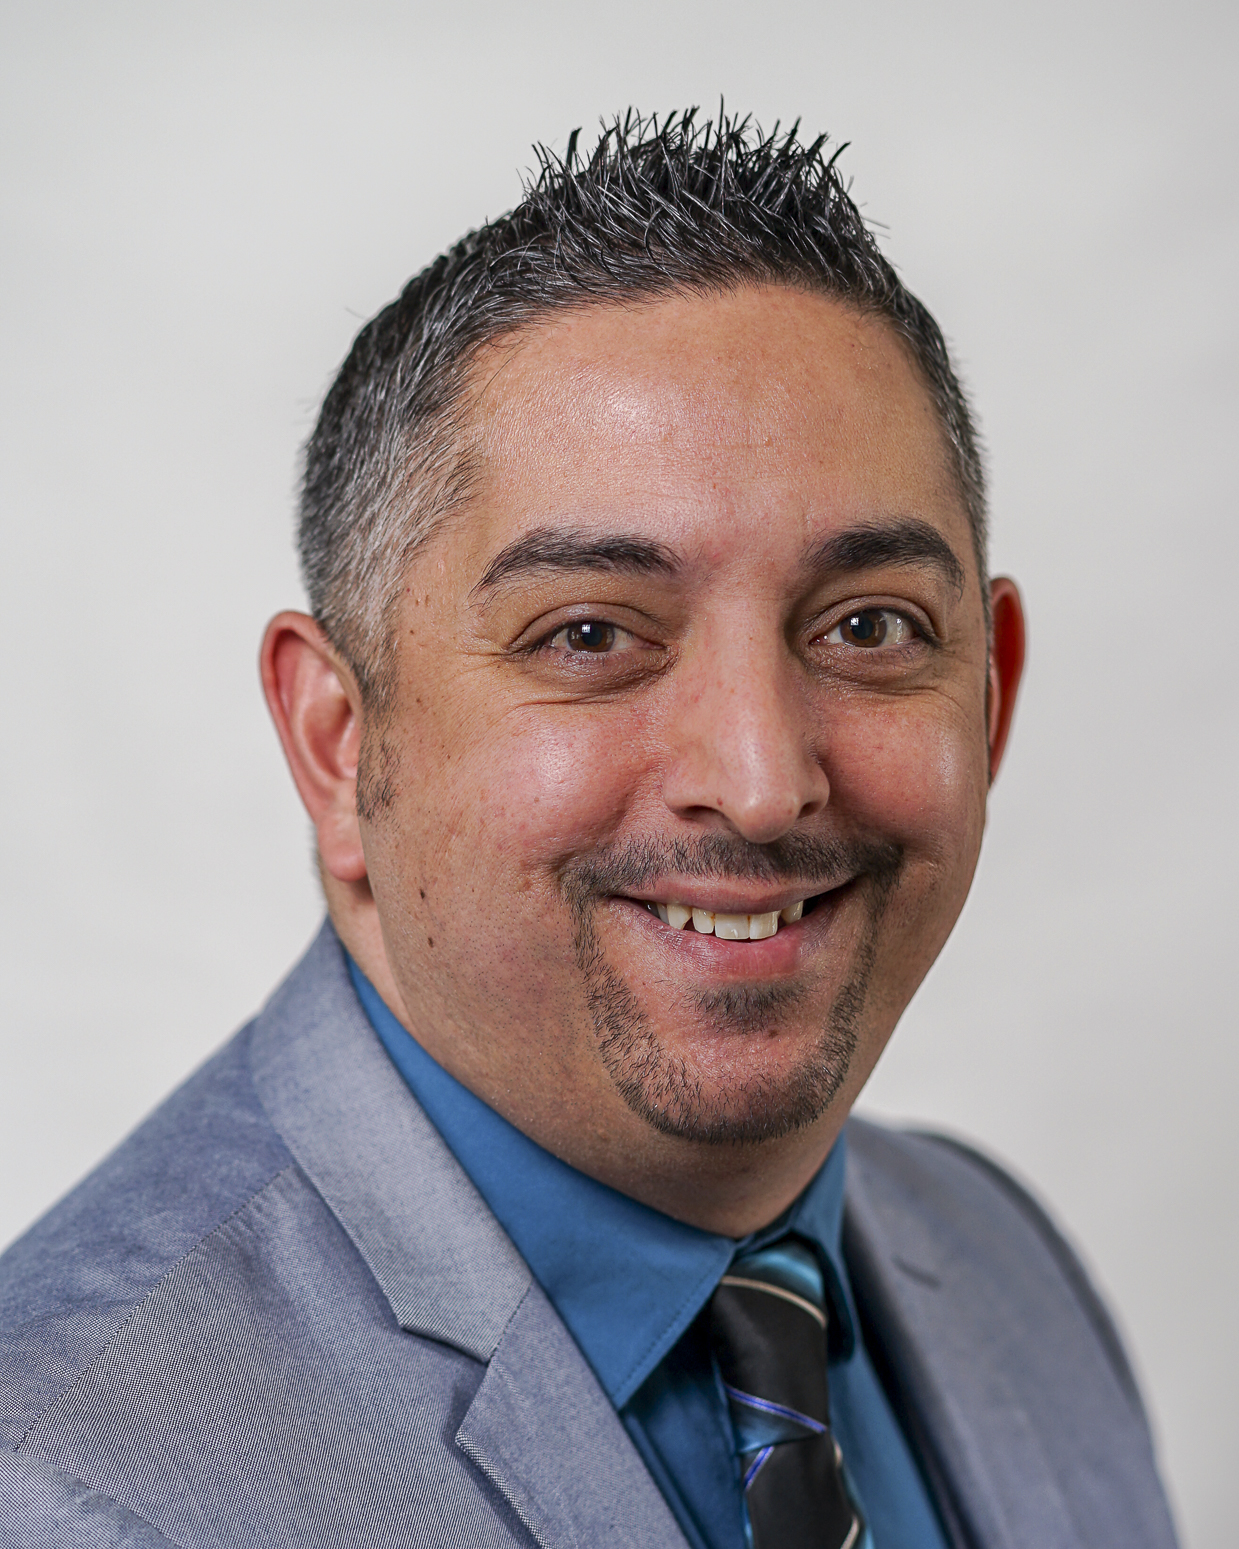 Chad Juarez - Farmers Insurance Agent in Lees Summit, MO